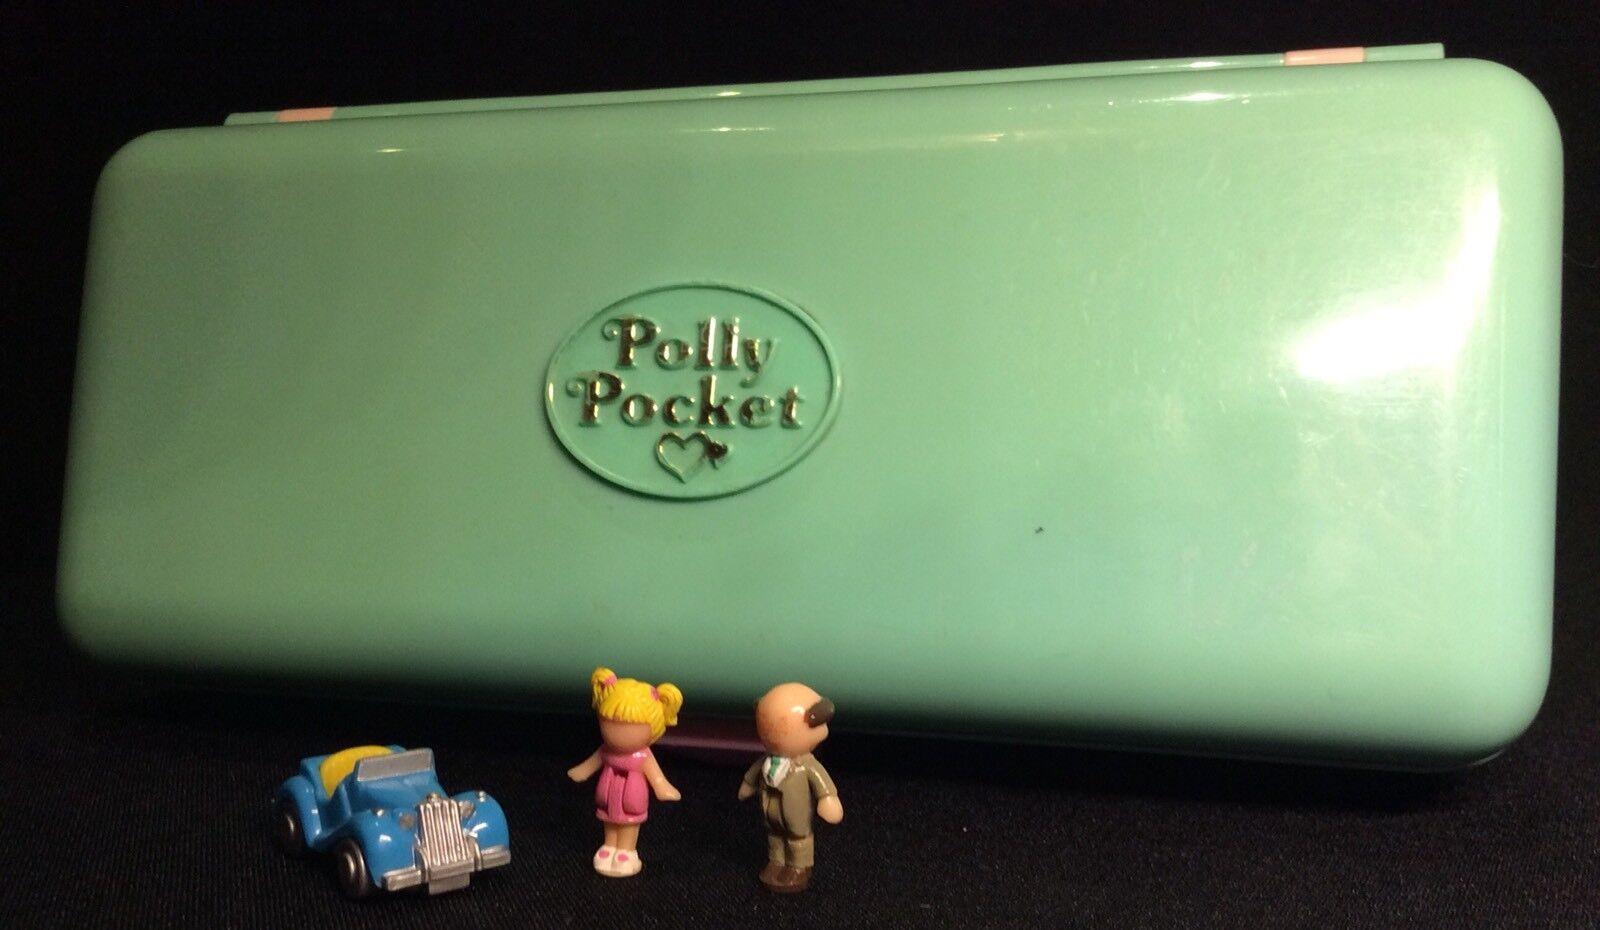 Polly Pocket mini  1989 High Street Money Box Play-Set And Trinket Box 3.1